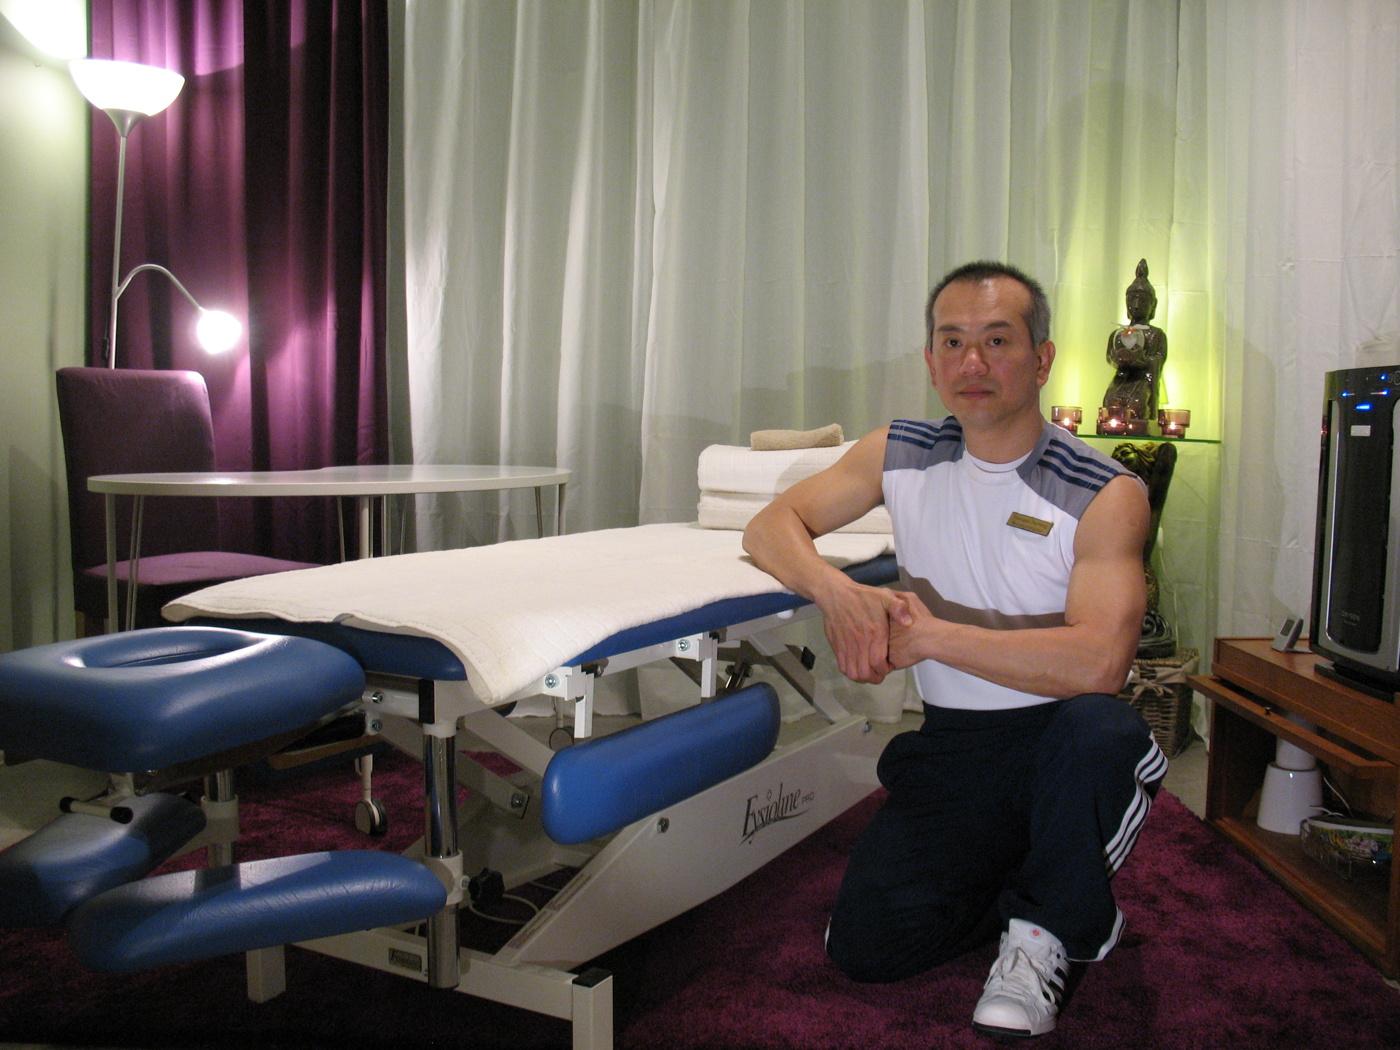 thai östermalm adoos massage stockholm